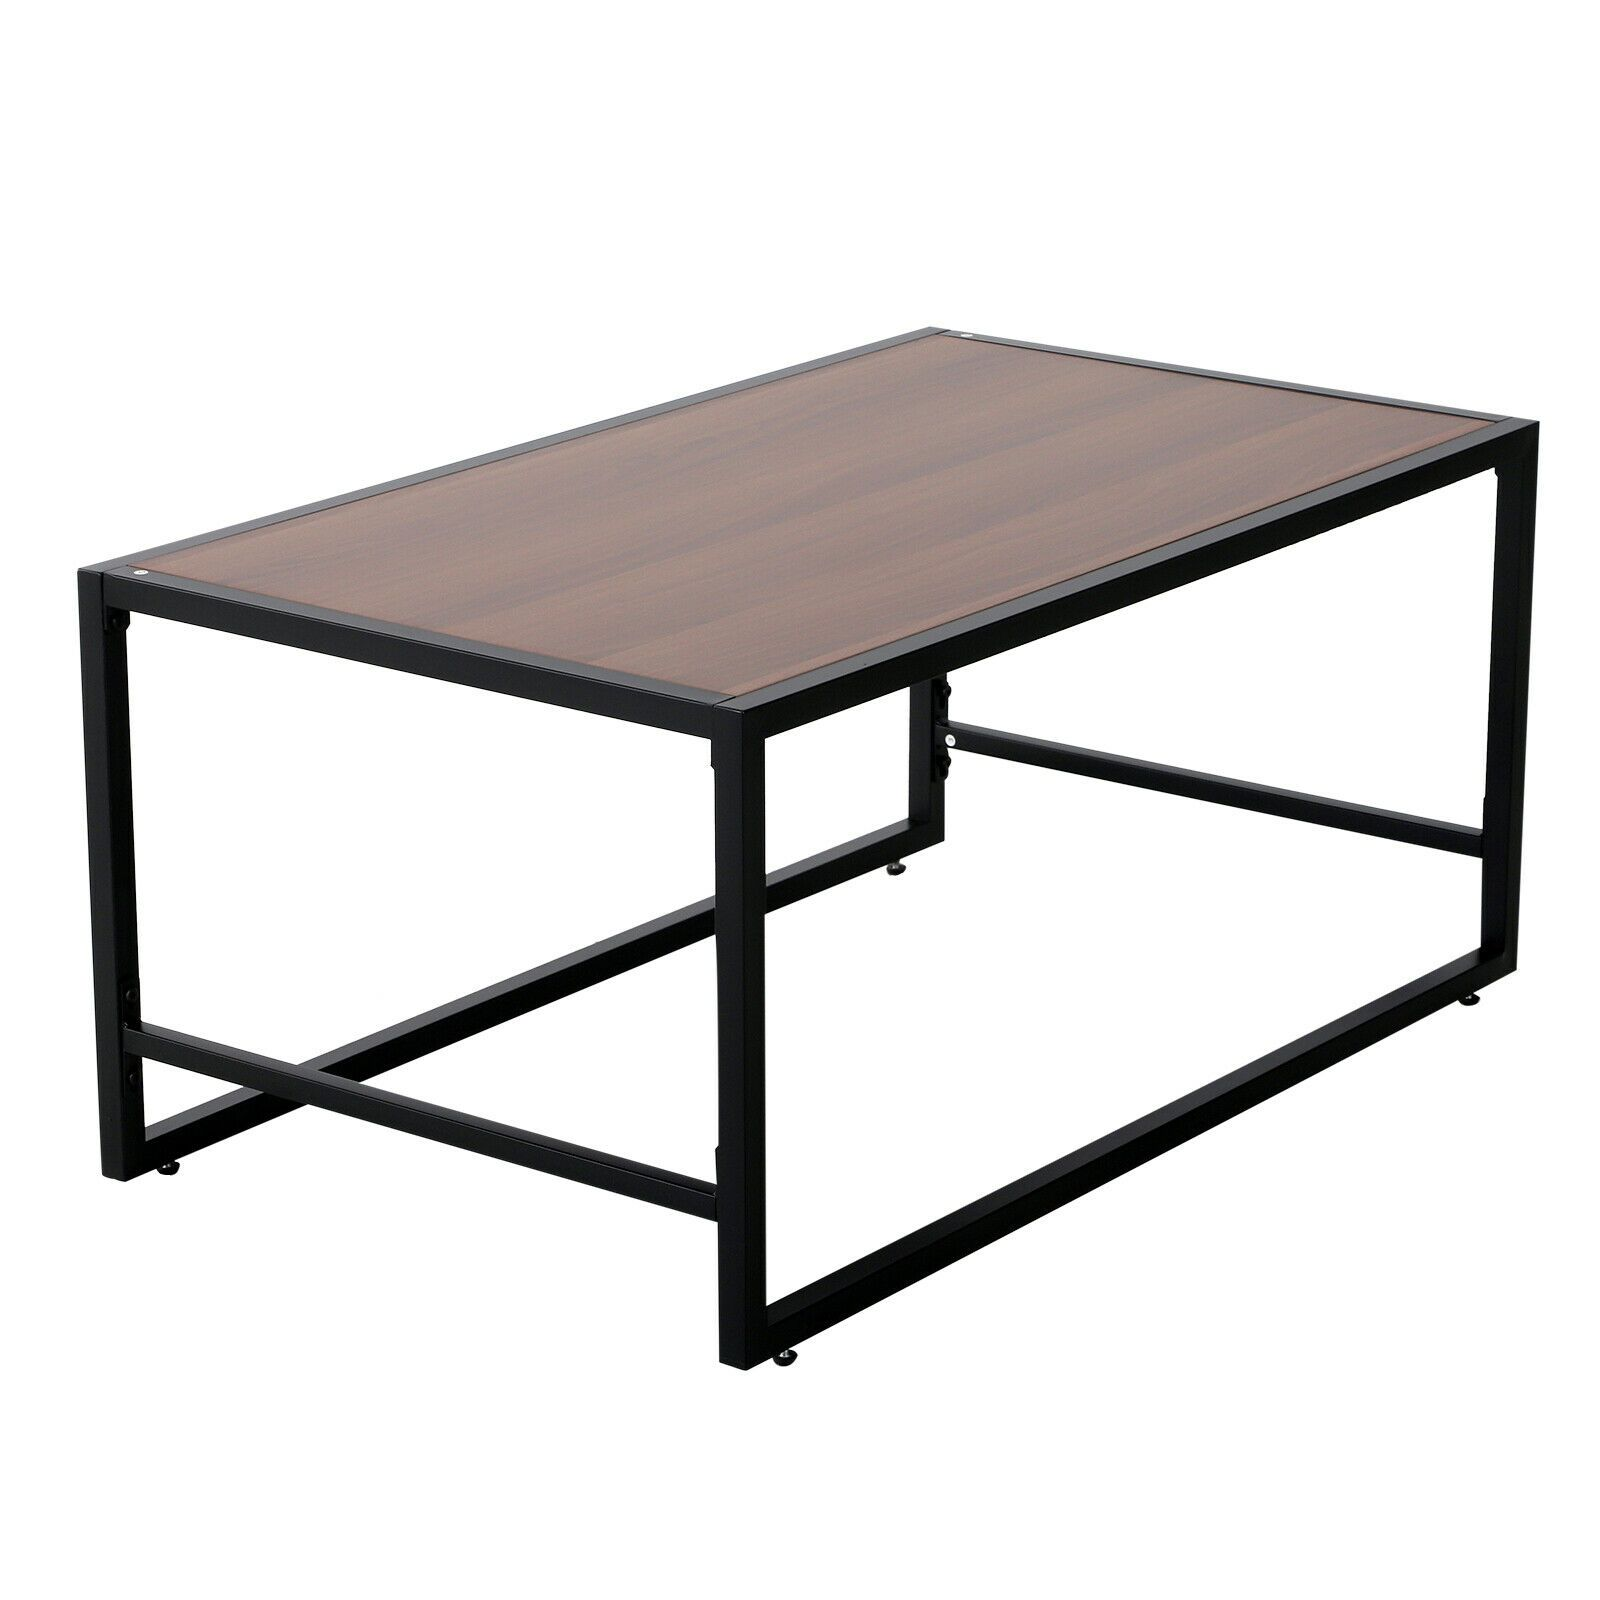 Table Salon Noir | Salon De Jardin Modulable En Résine Tressée